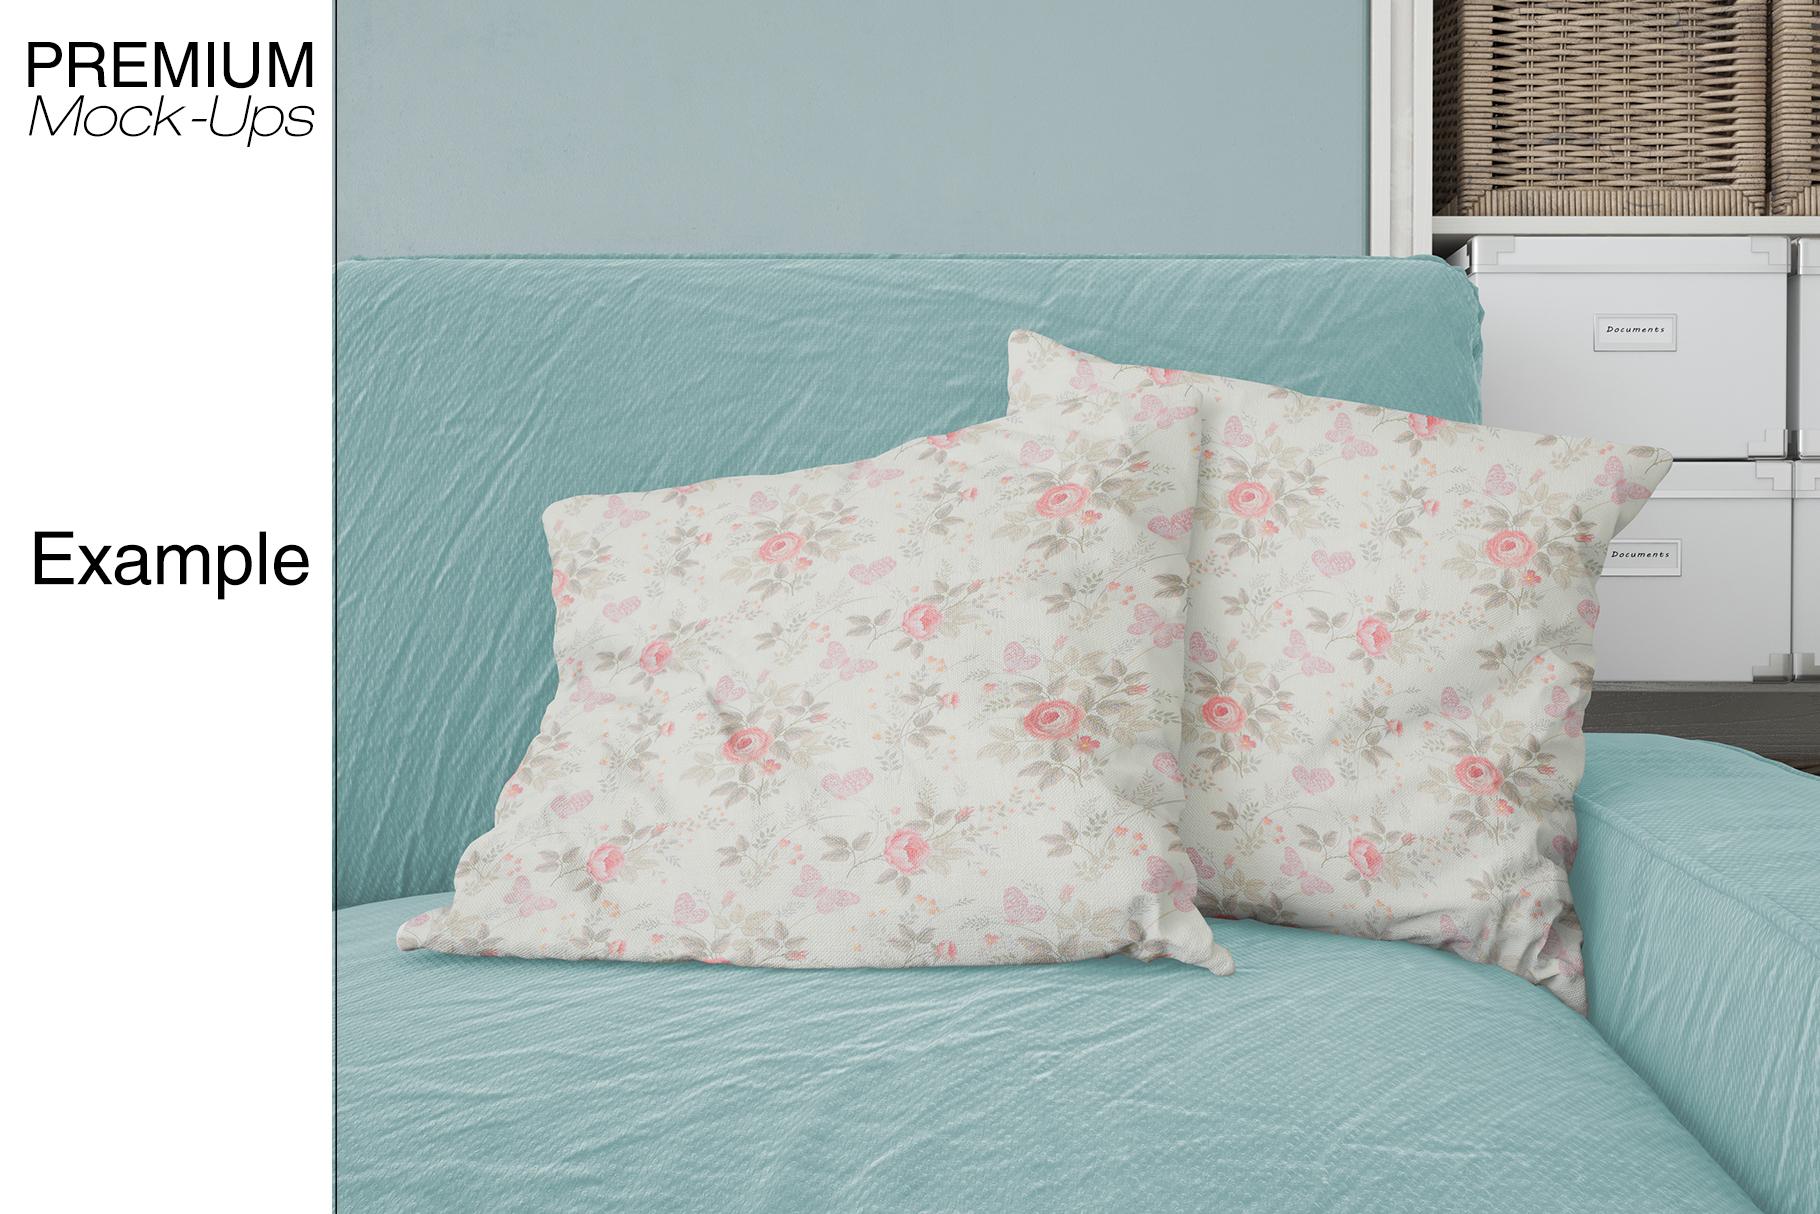 Pillows & Frames Mockup Set example image 21